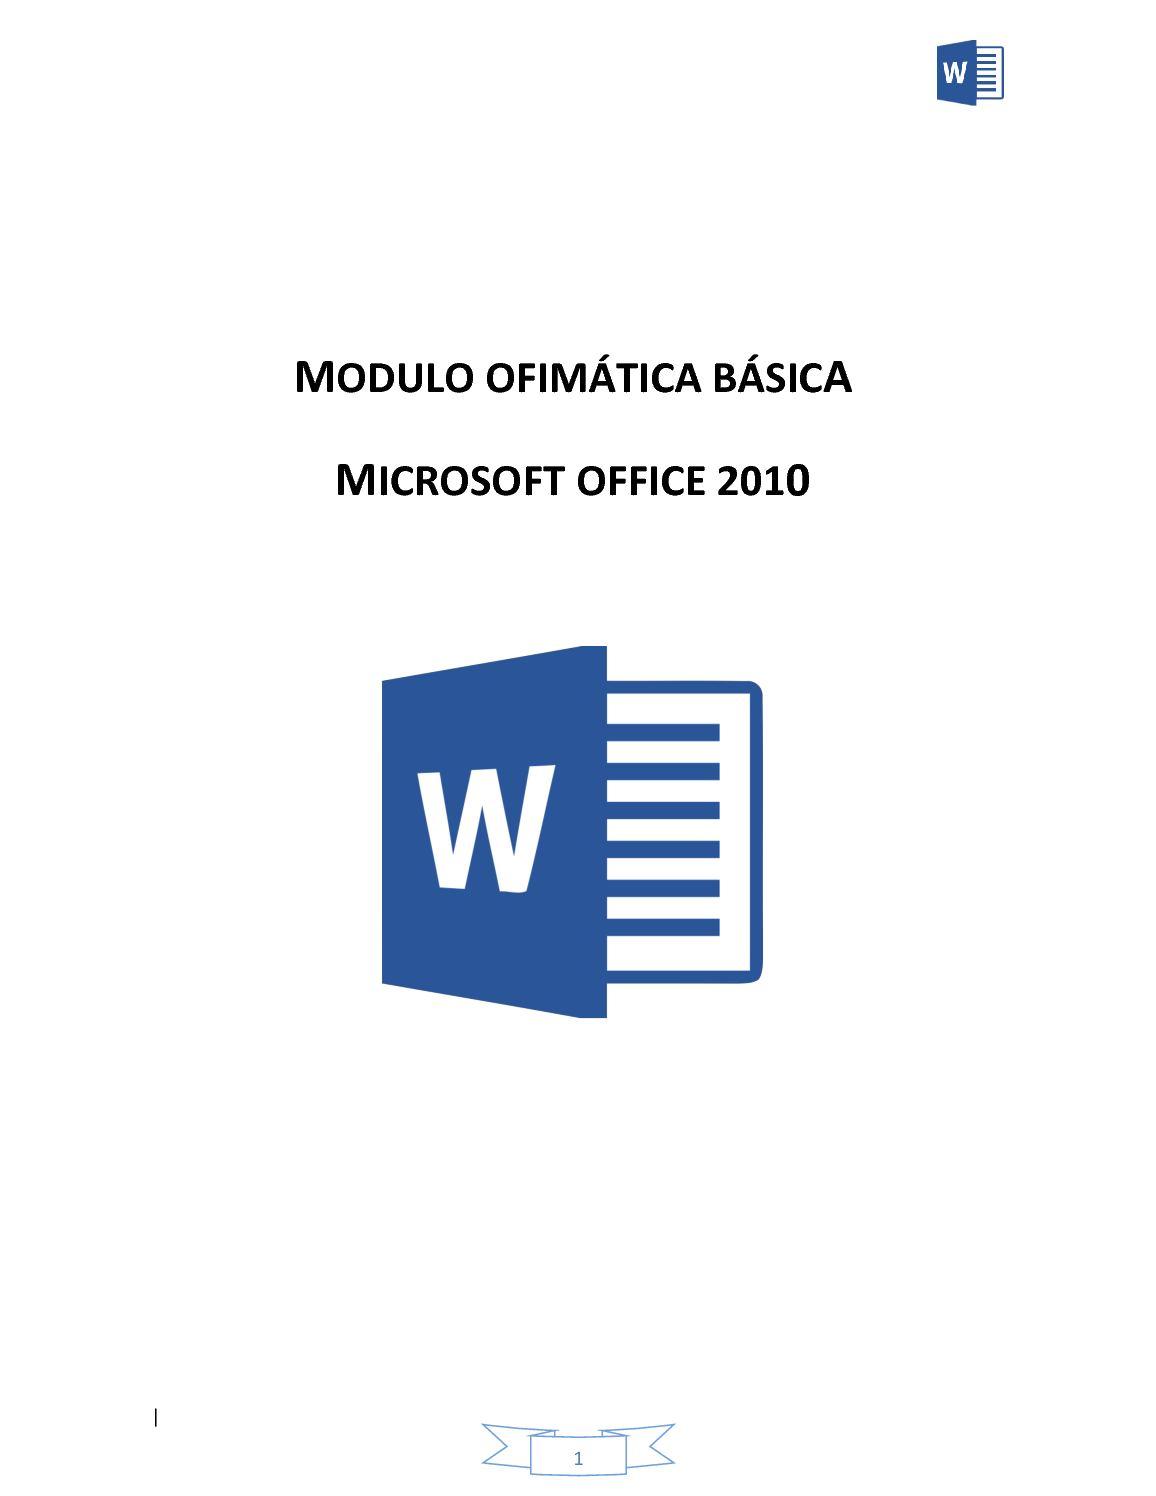 MODULO WORD 2010